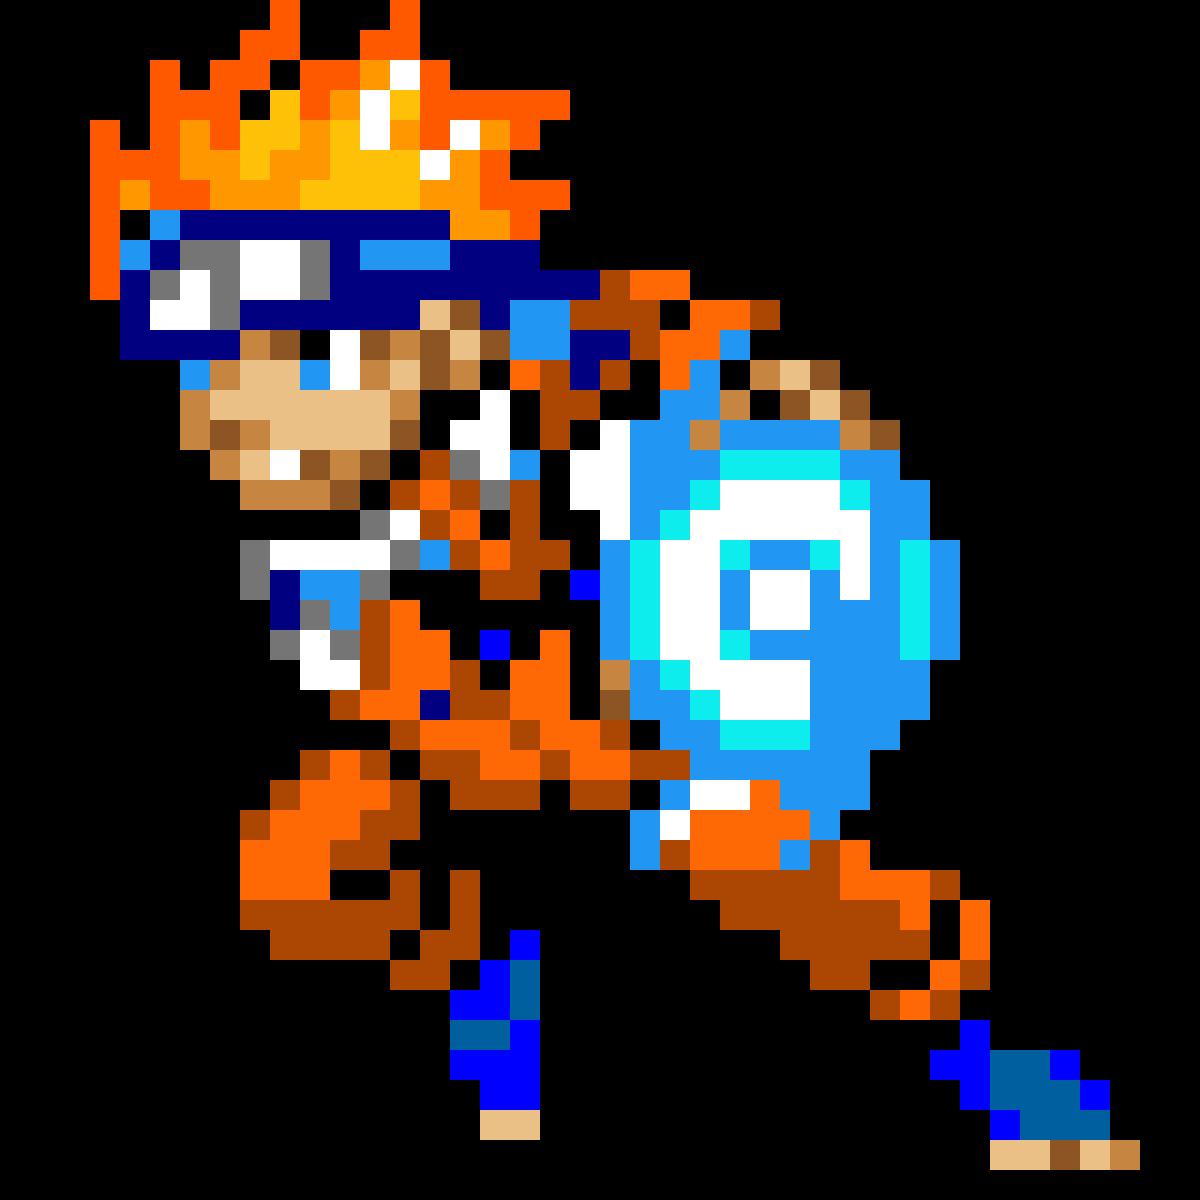 Minecraft Naruto Art Pixel Area Download Free Image Pixel Art Anime Pixel Art Pixel Art Pattern